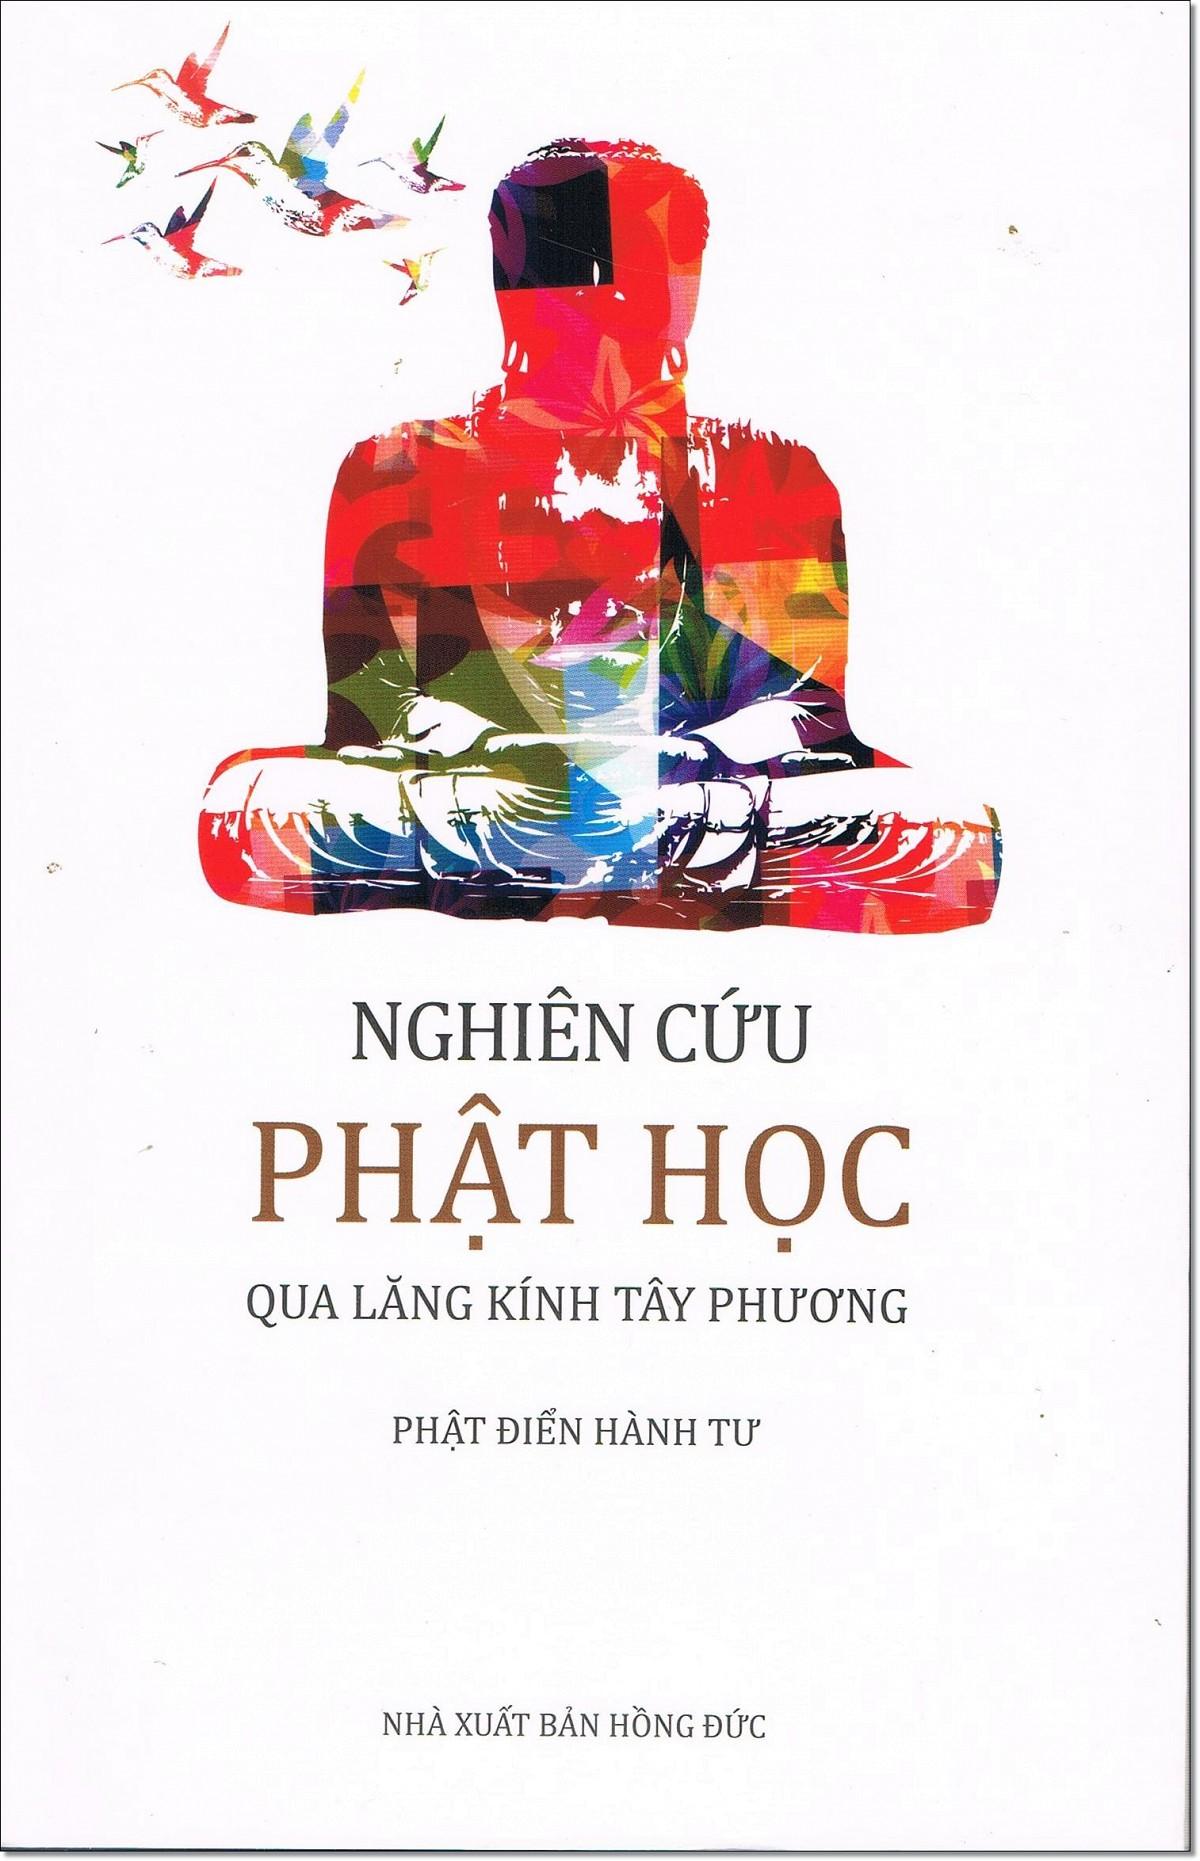 nghien-cuu-phat-hoc-qua-lang-kinh-tay-ph.u4939.d20170324.t112103.663072.jpg